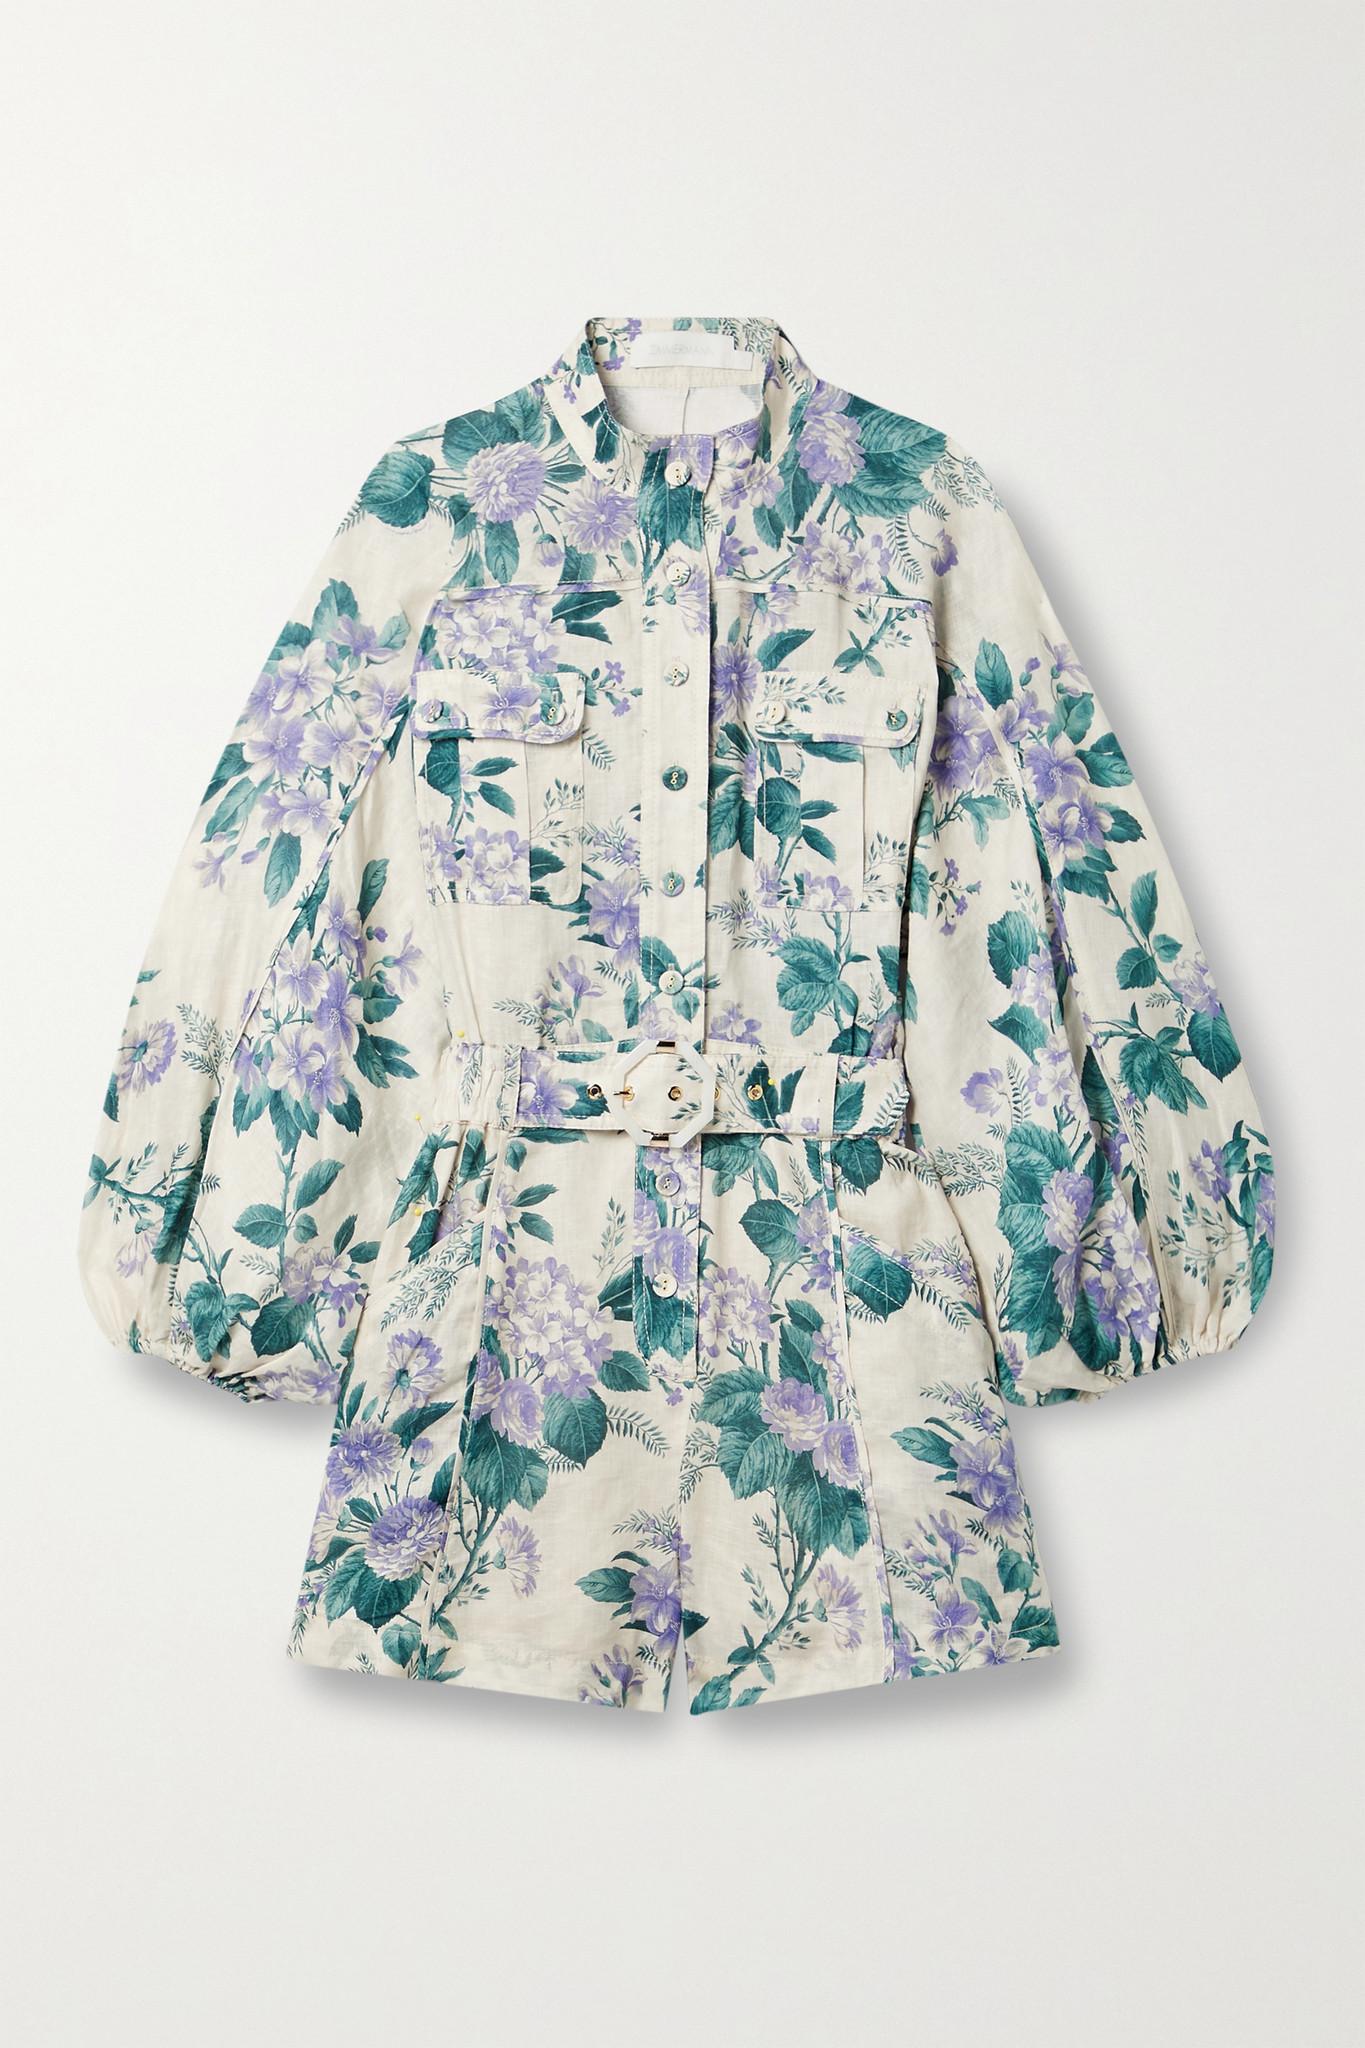 ZIMMERMANN - Cassia Belted Floral-print Linen Playsuit - Blue - 3